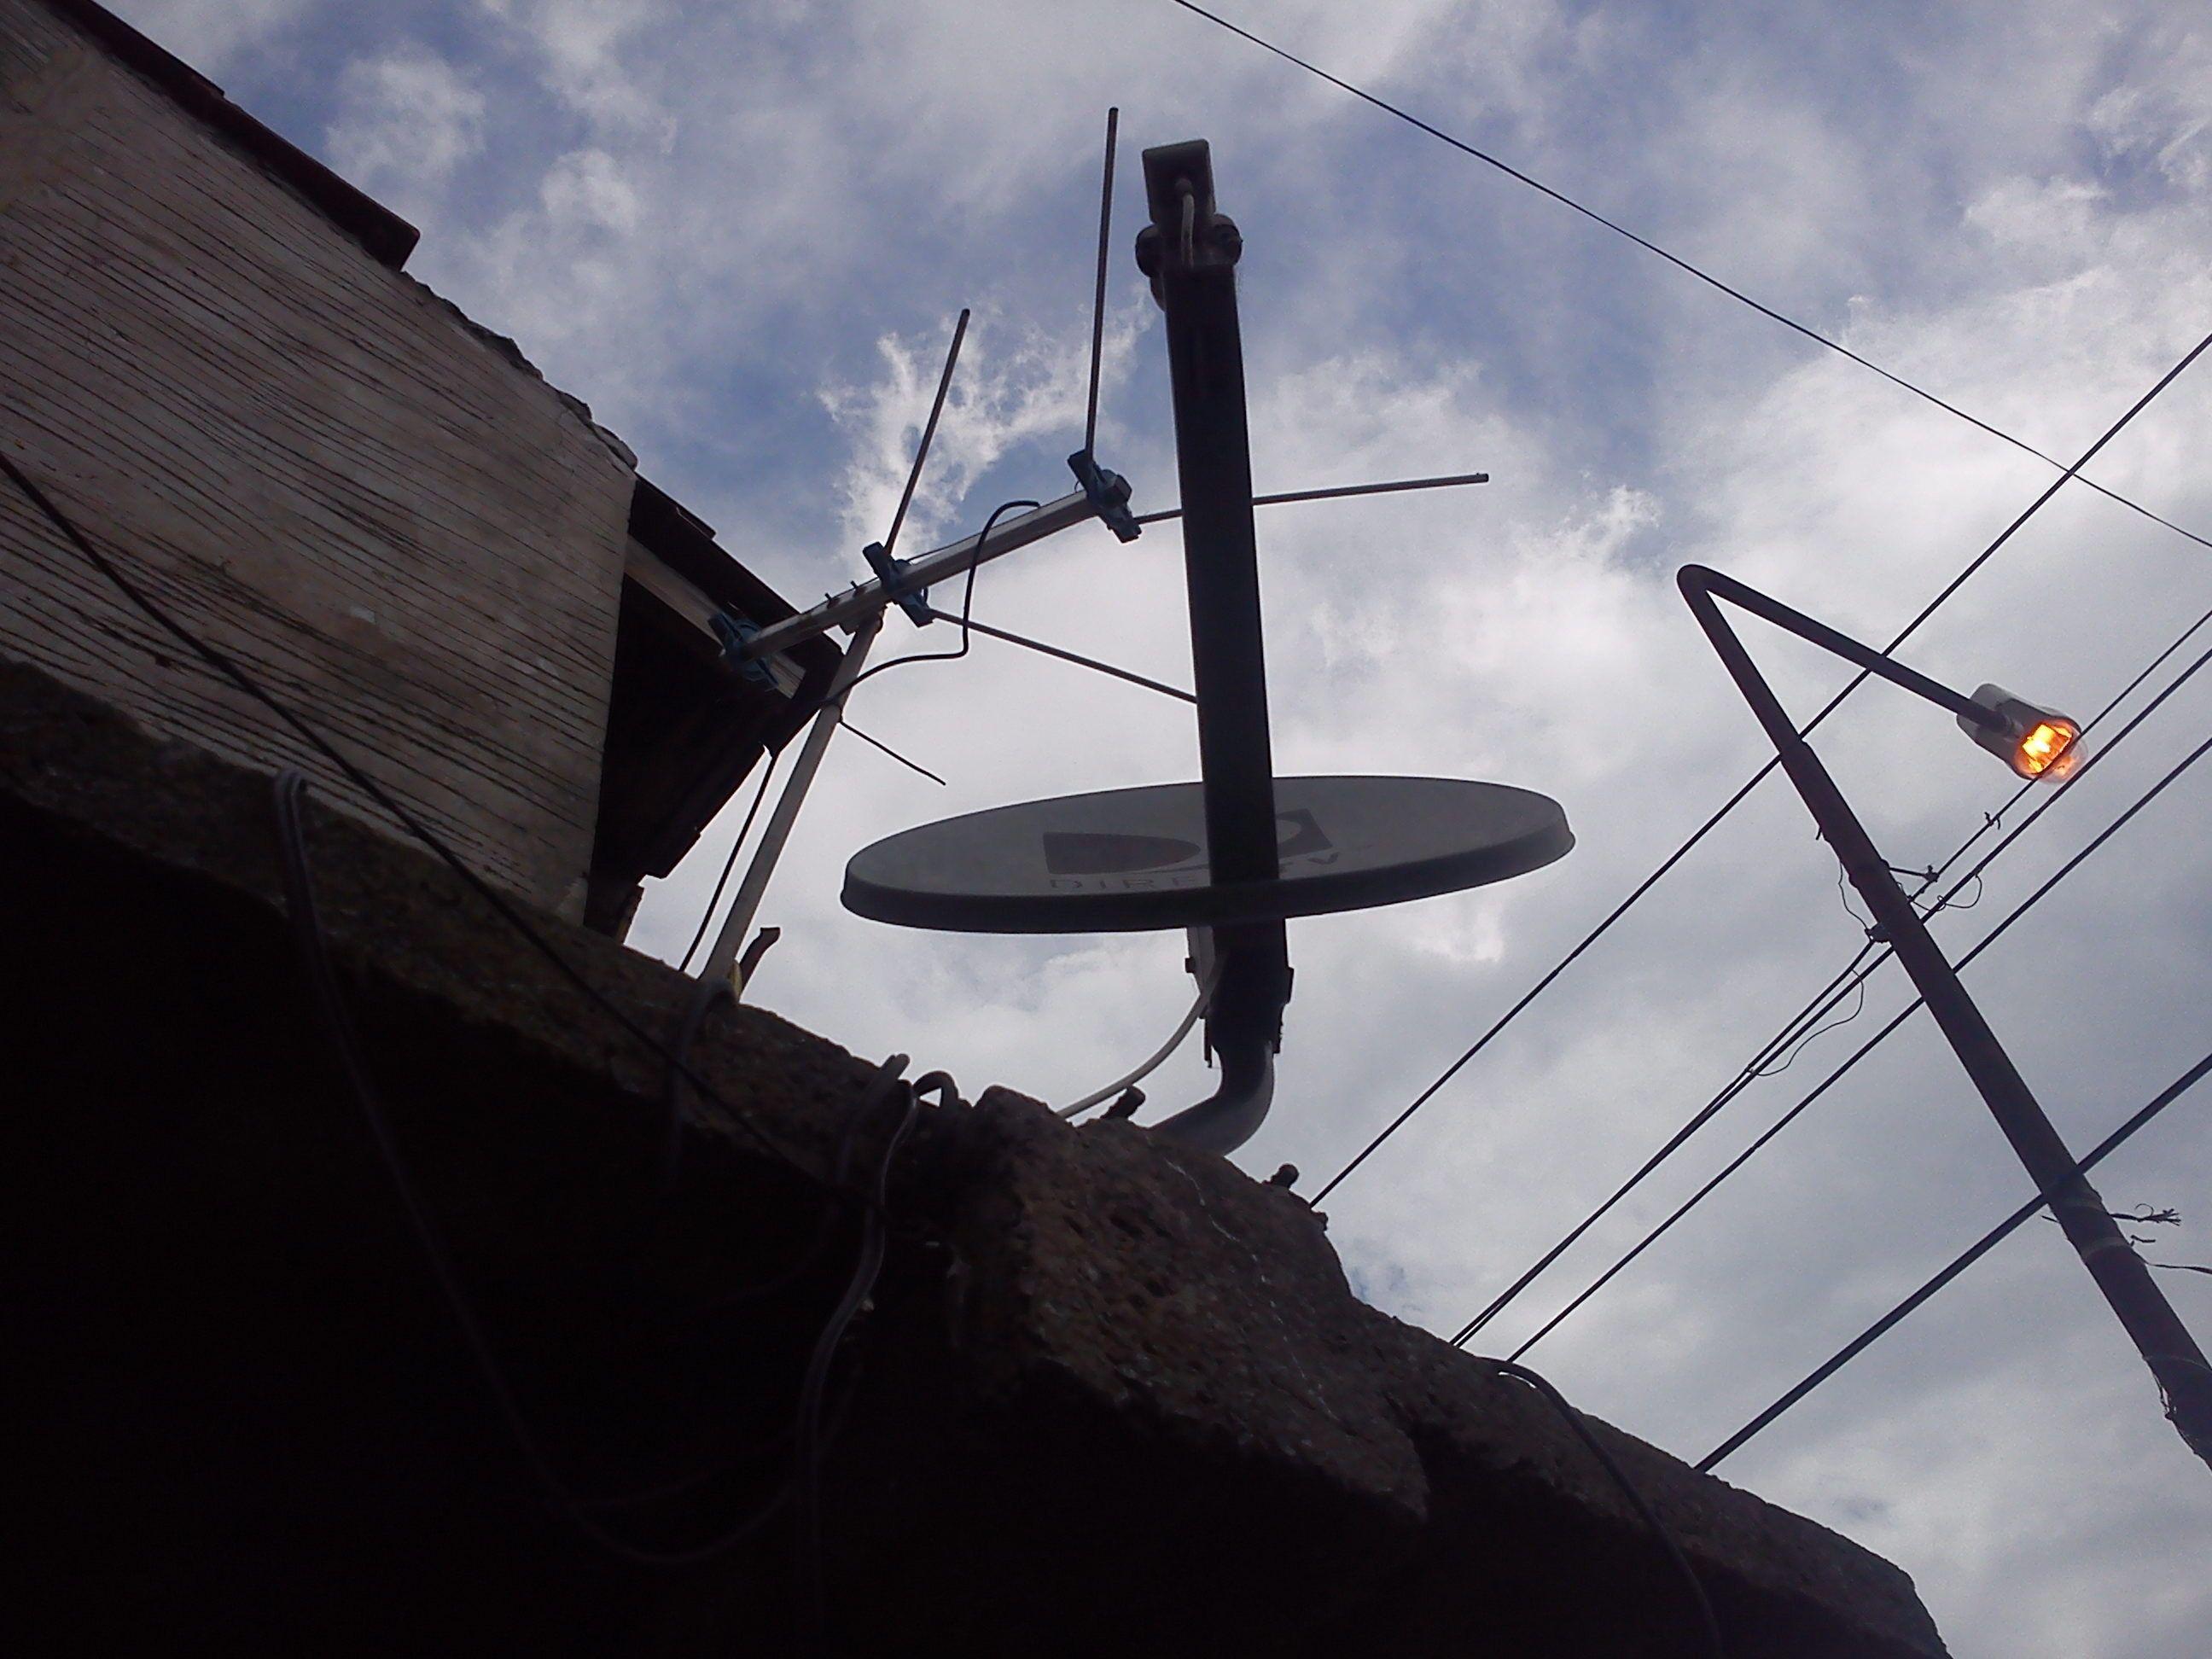 Instalacion Paso A Paso Television Satelital Gratis Utility Pole Diy